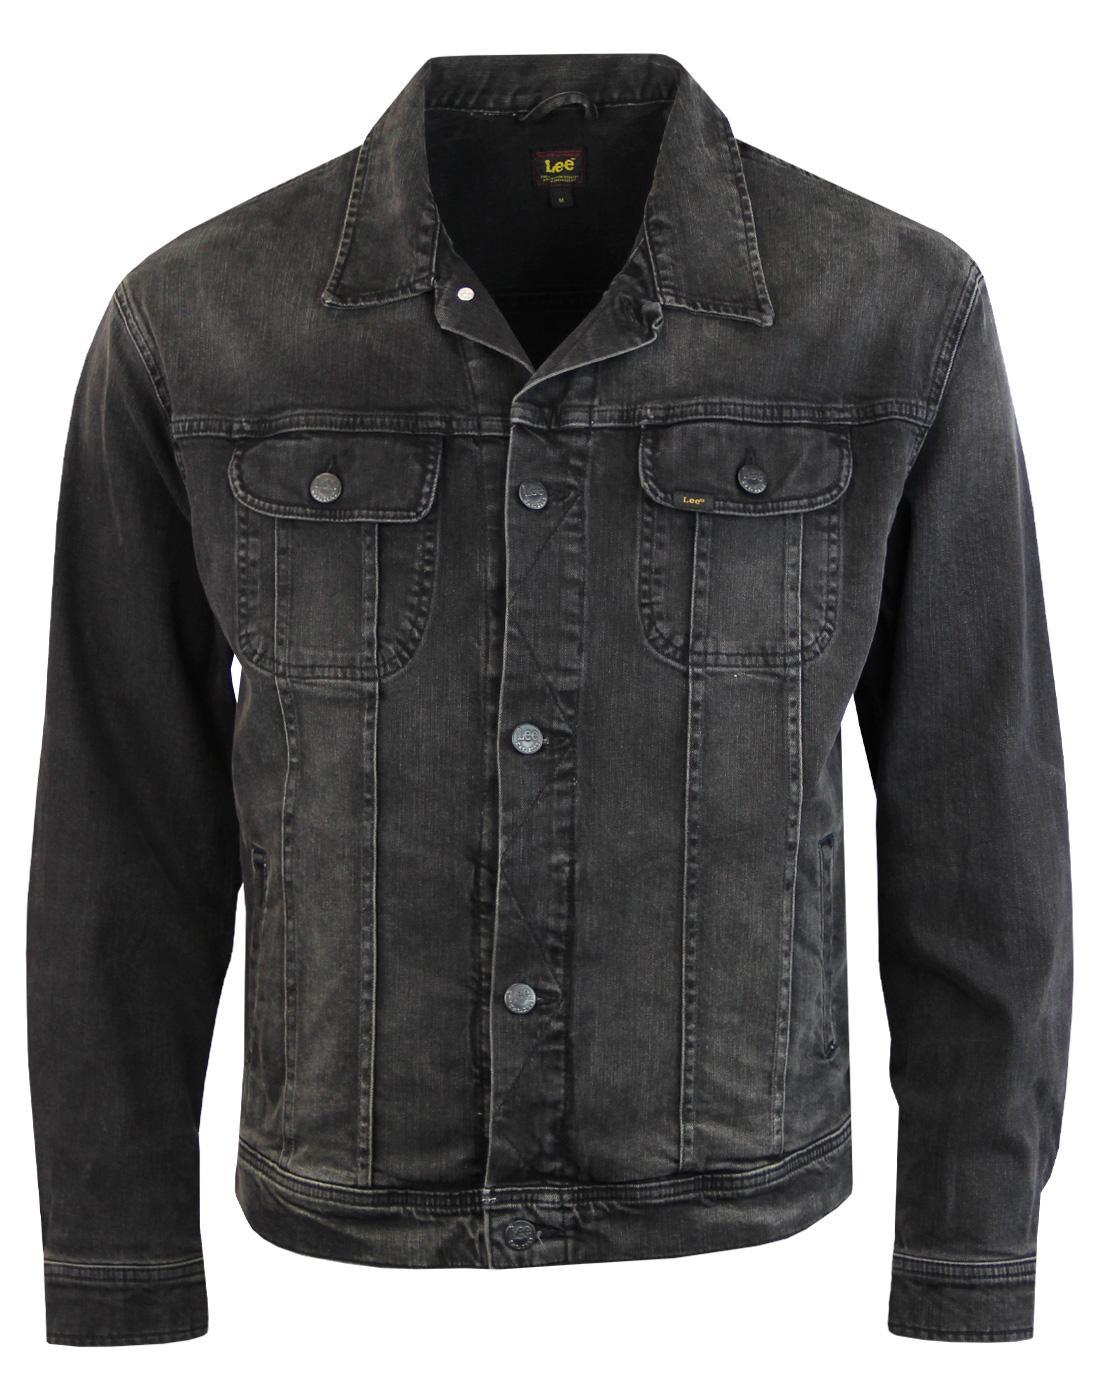 LEE Oversized Rider Retro Punk Deluxe Denim Jacket